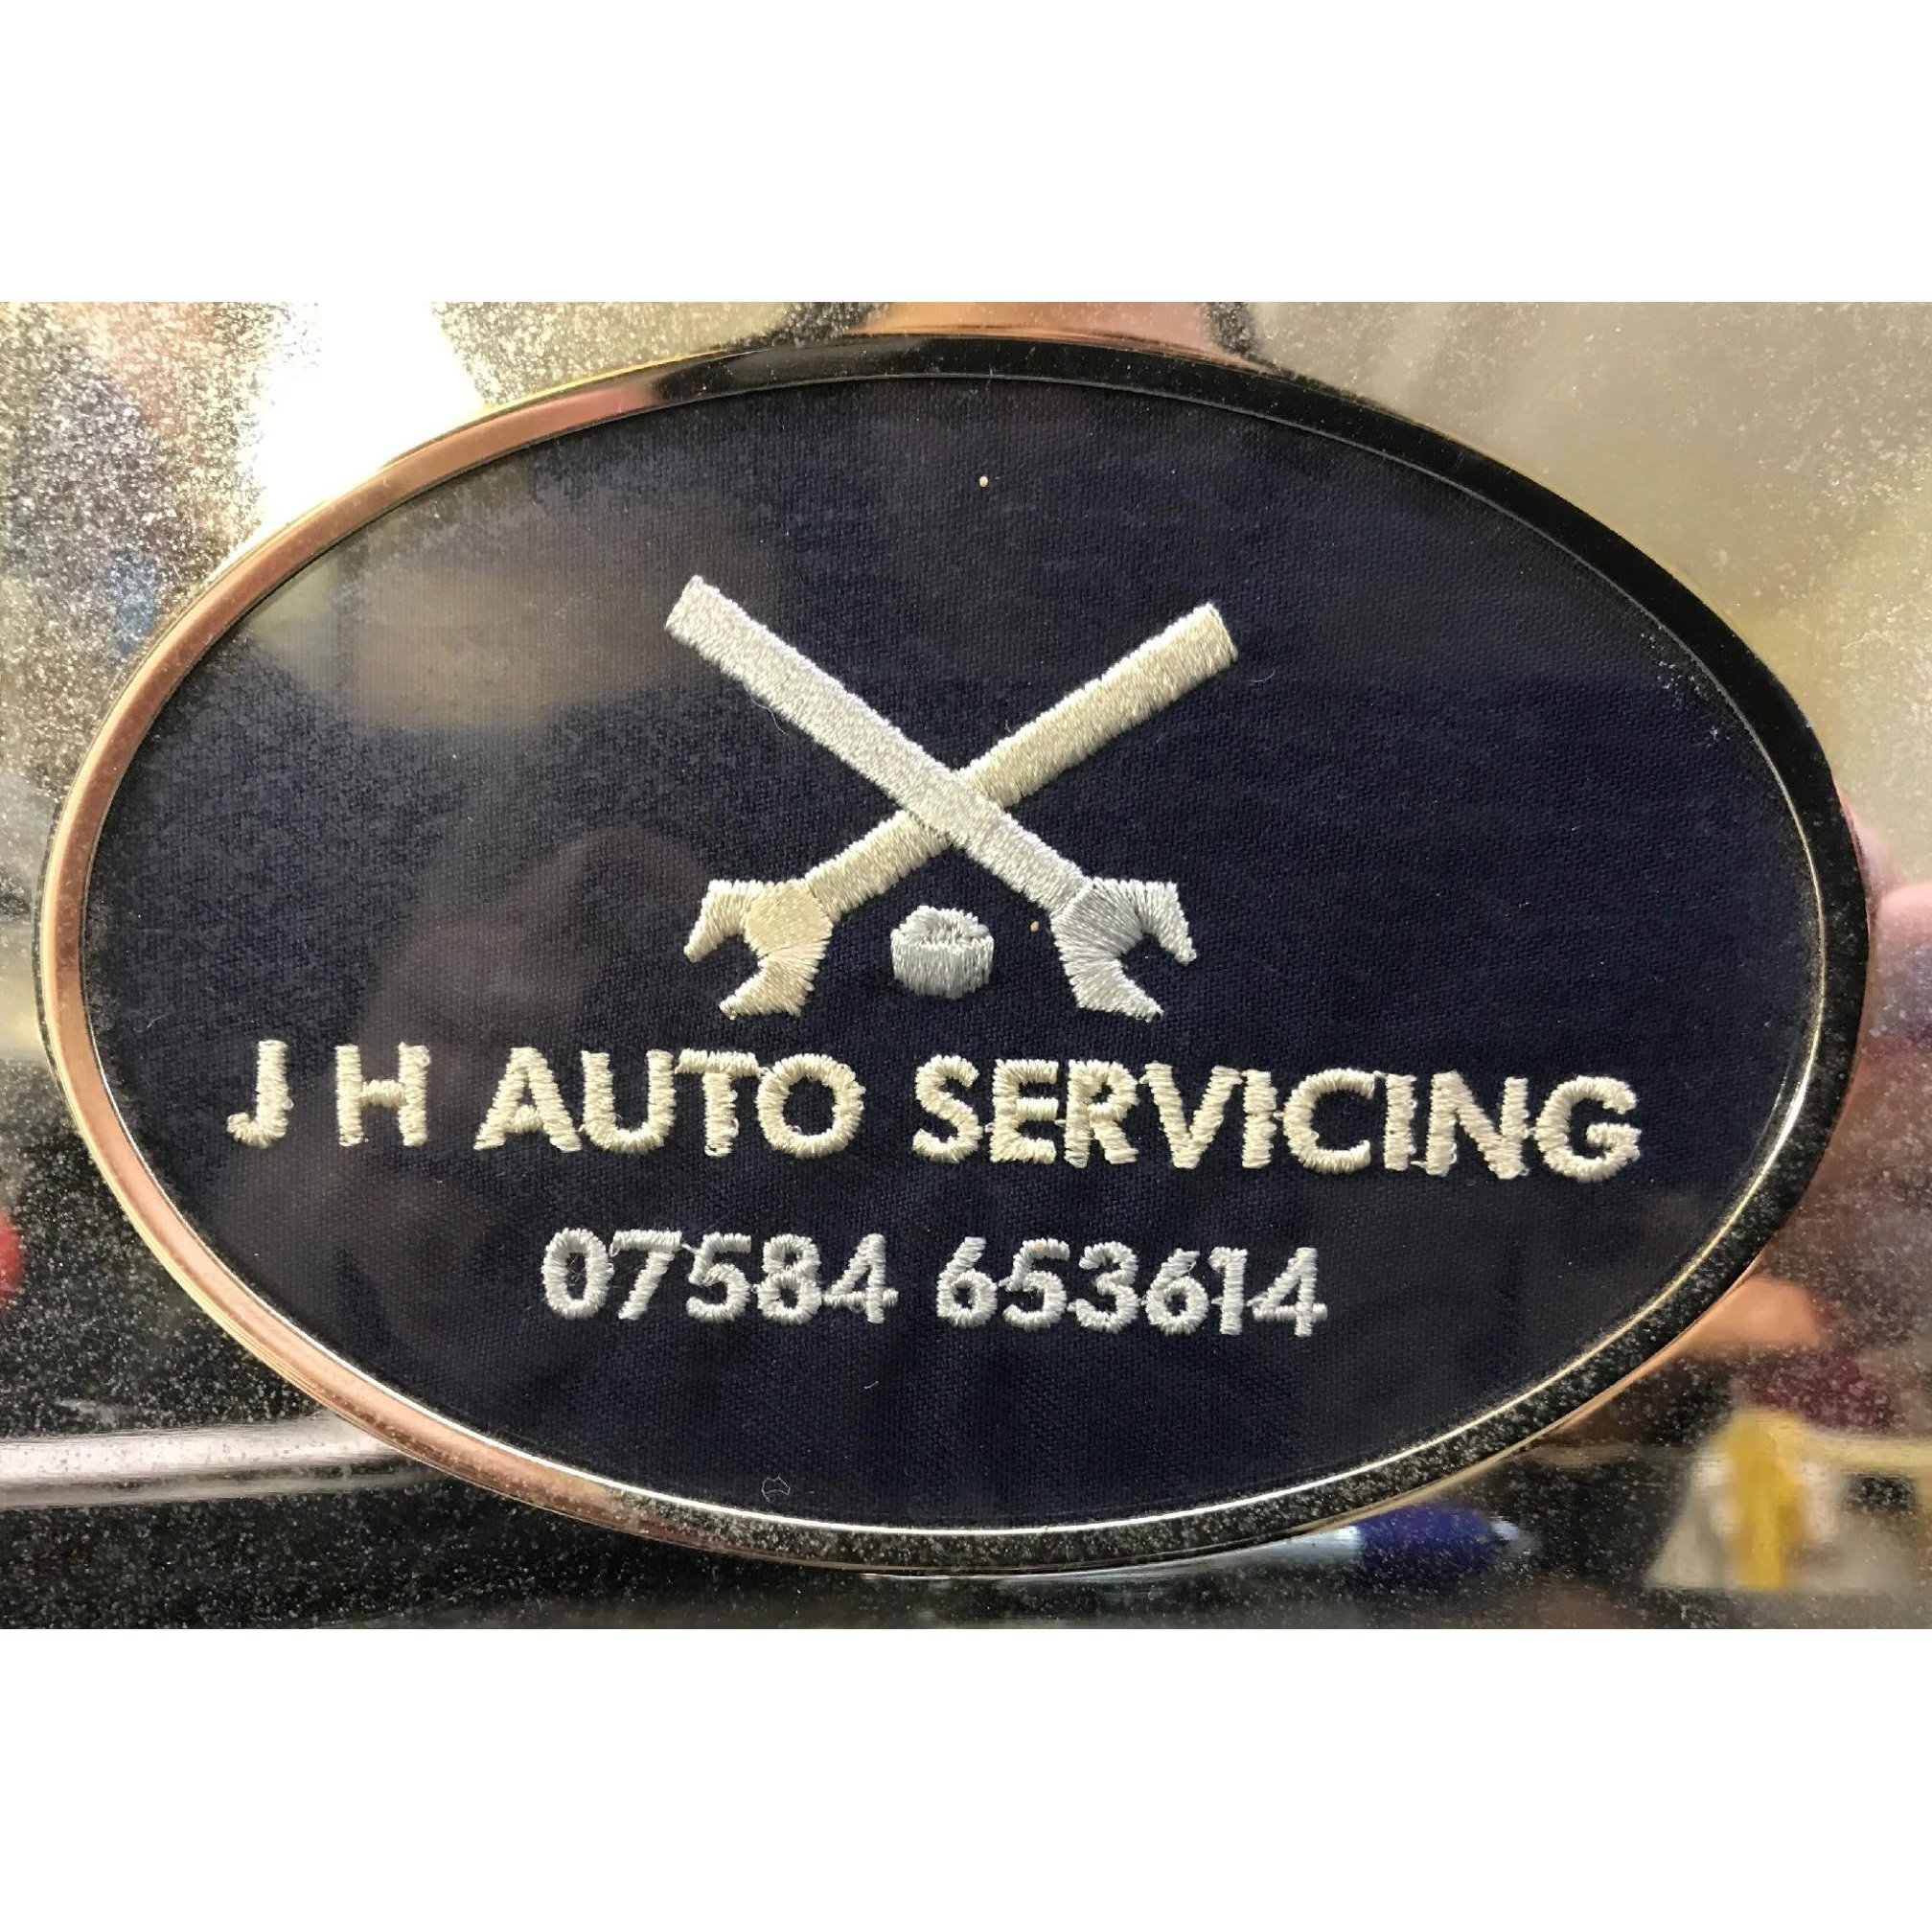 J.H Auto Servicing